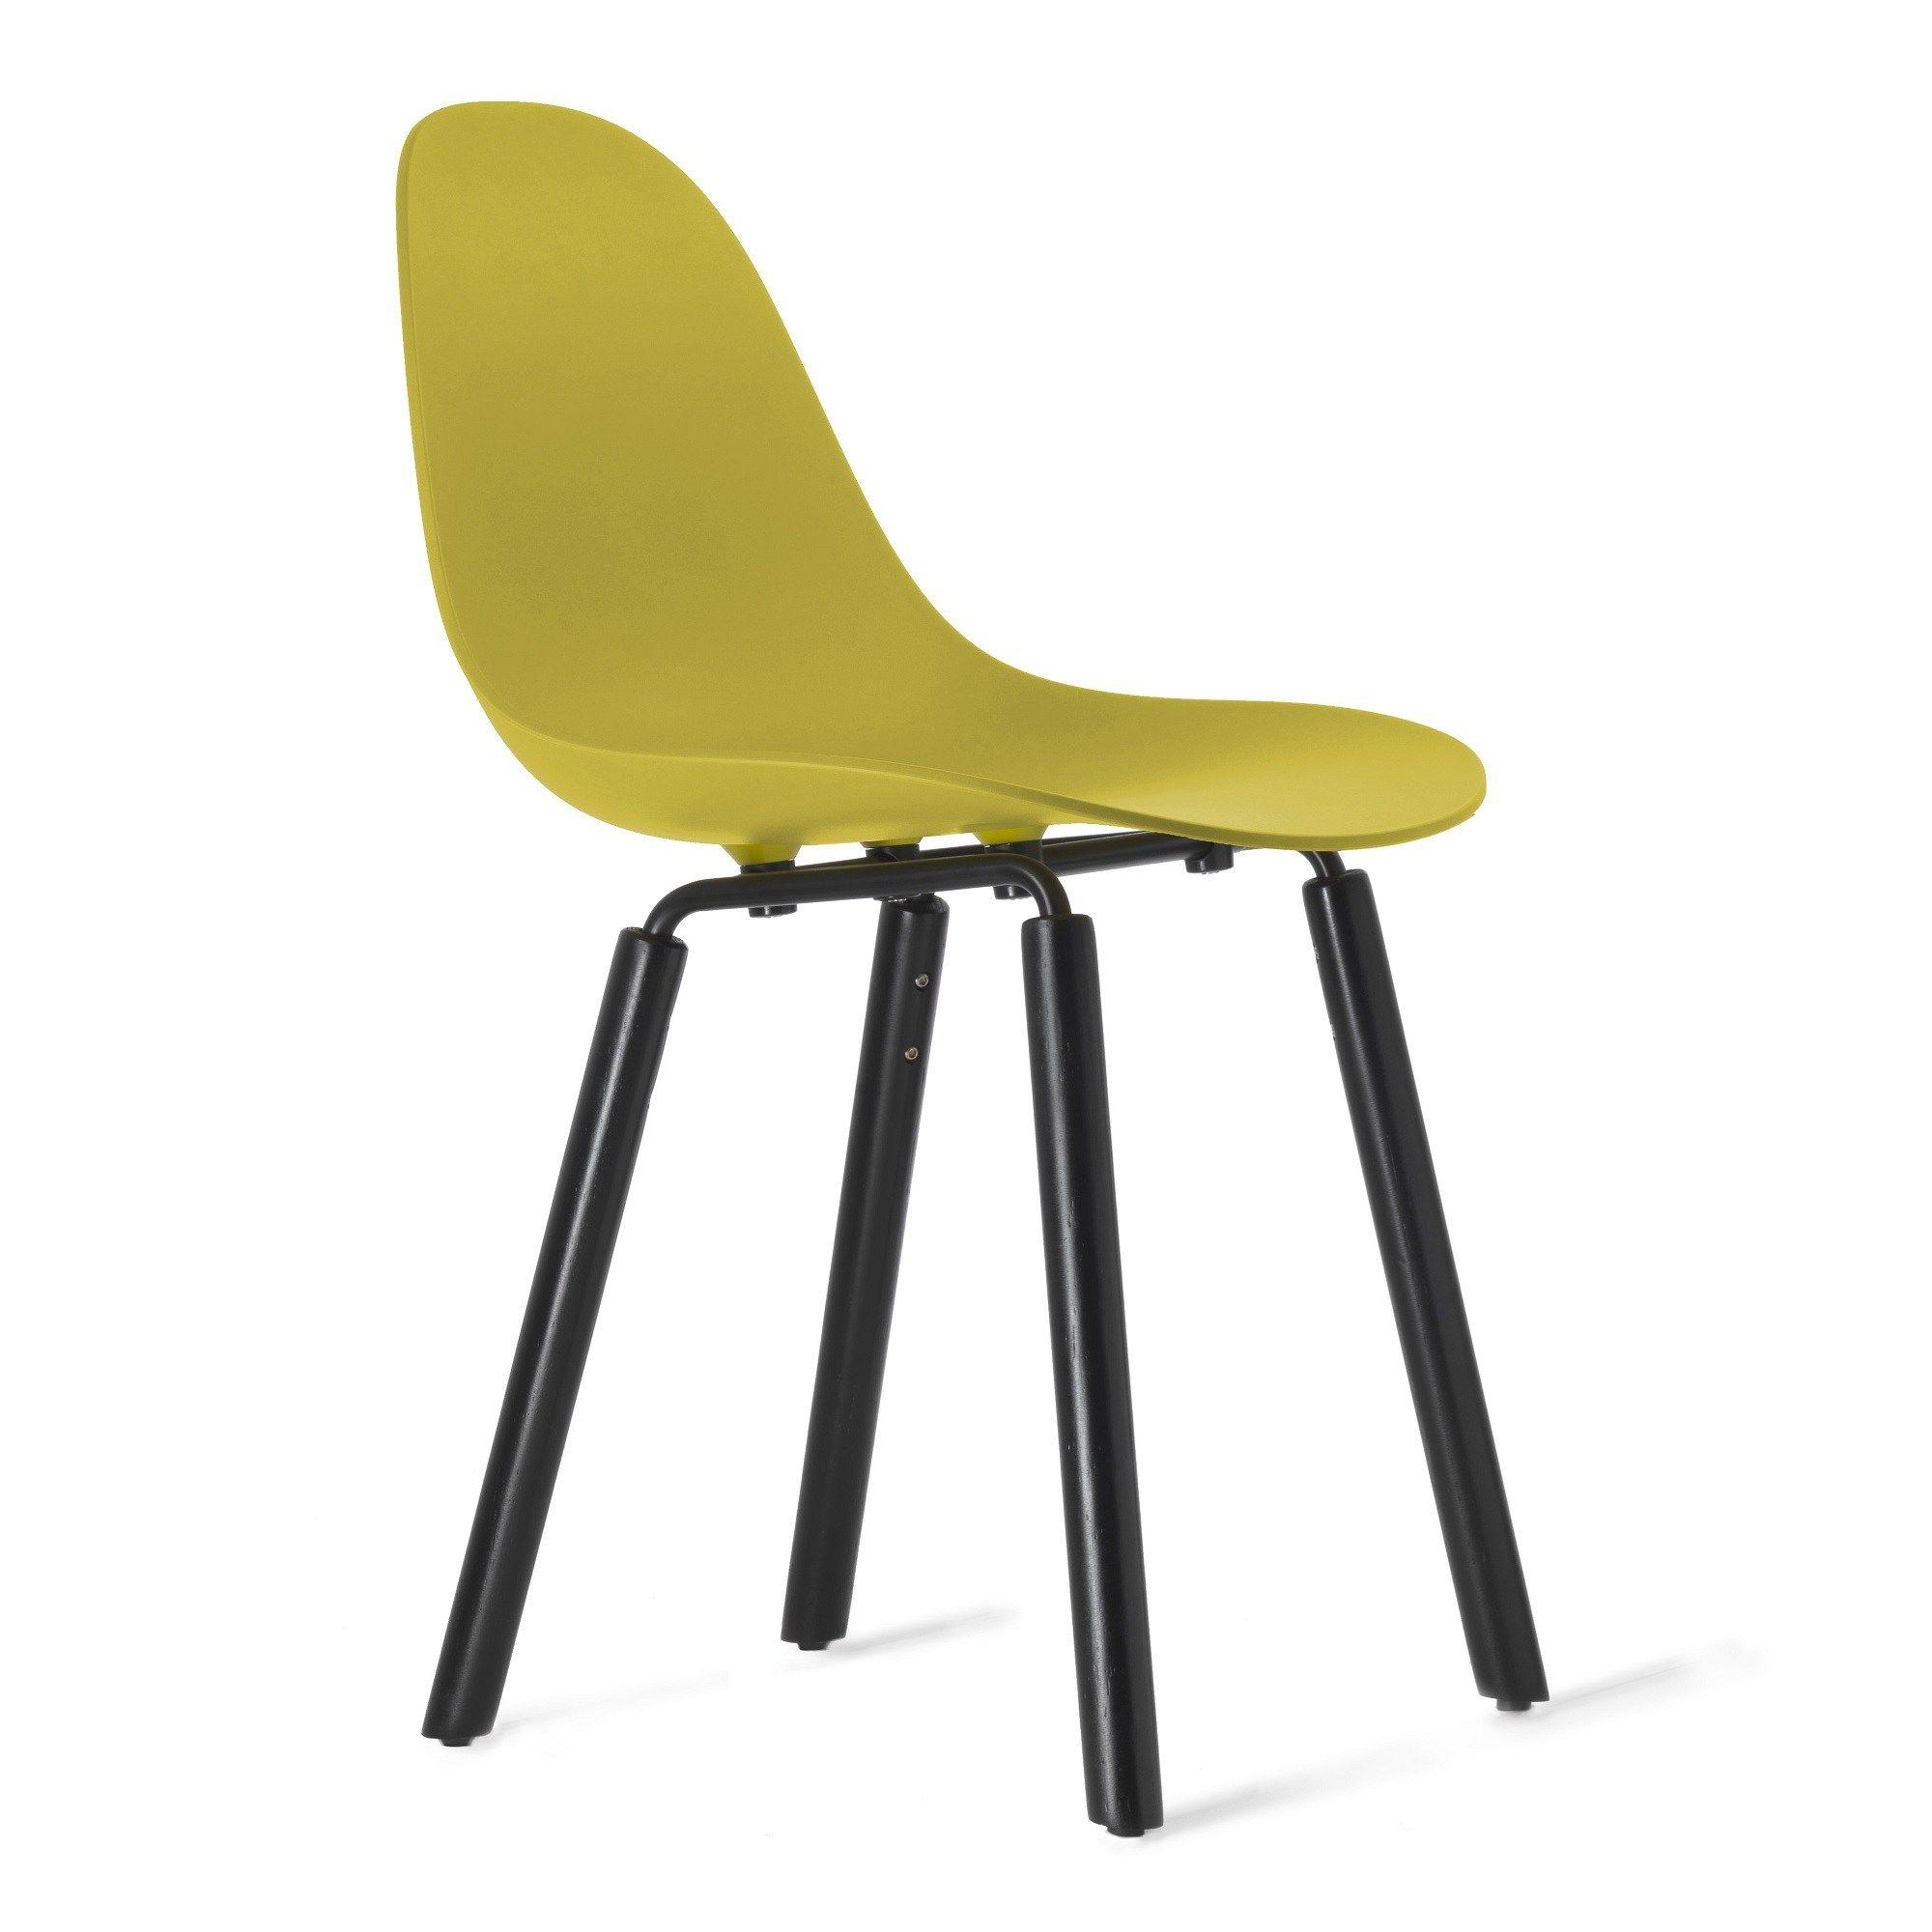 Sedia in legno in stile moderno TA Yi Black Sedia by KUBIKOFF design Simone Viola